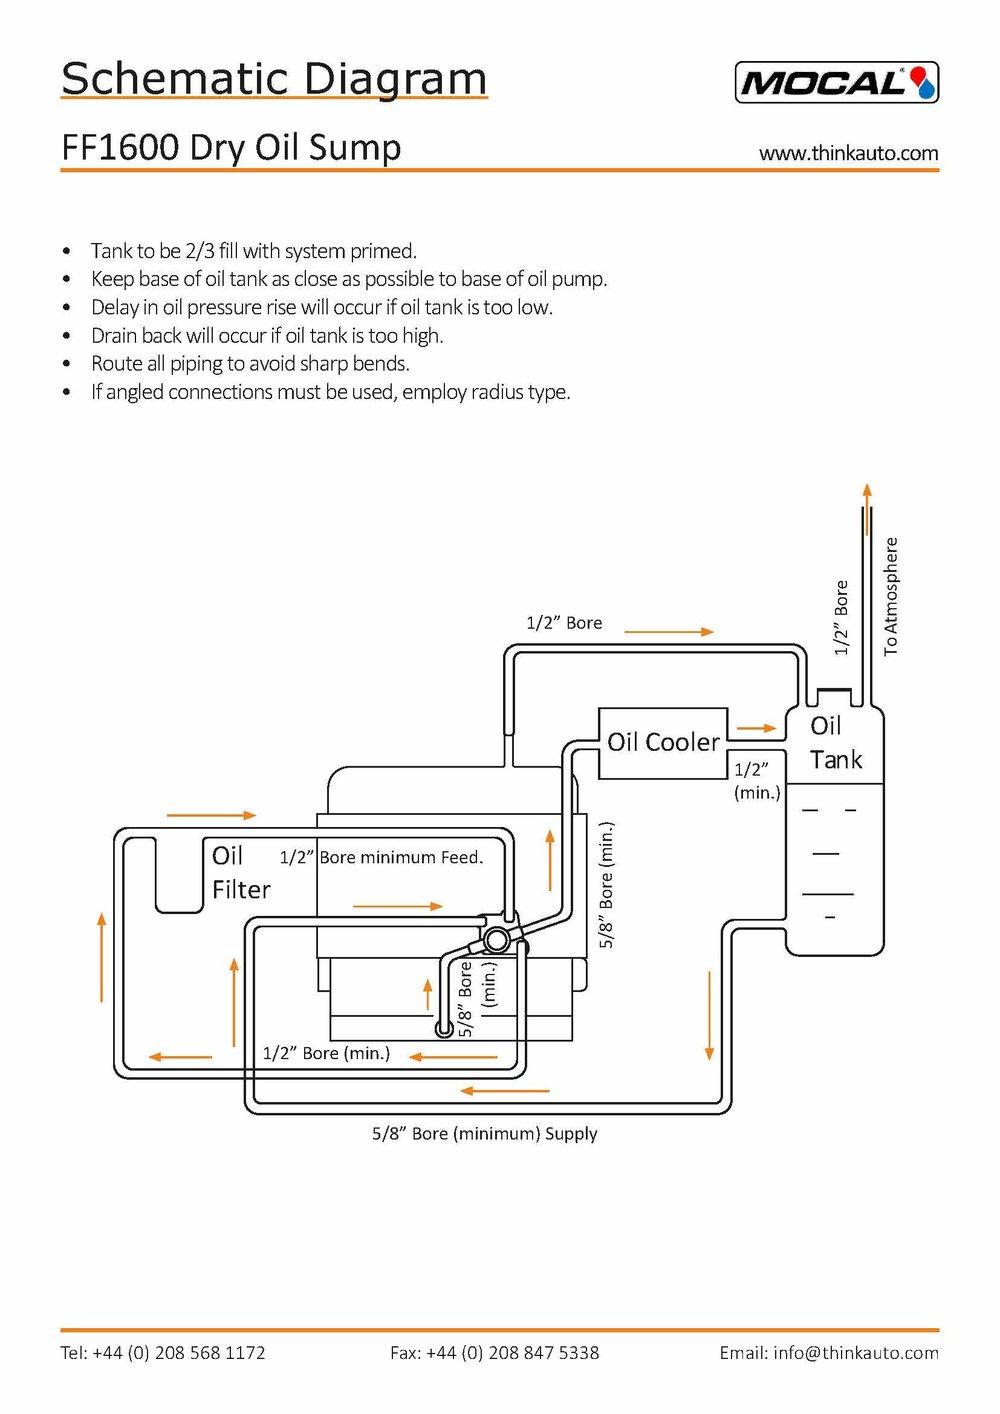 FF1600 Dry Sump Schematic Diagram.jpg